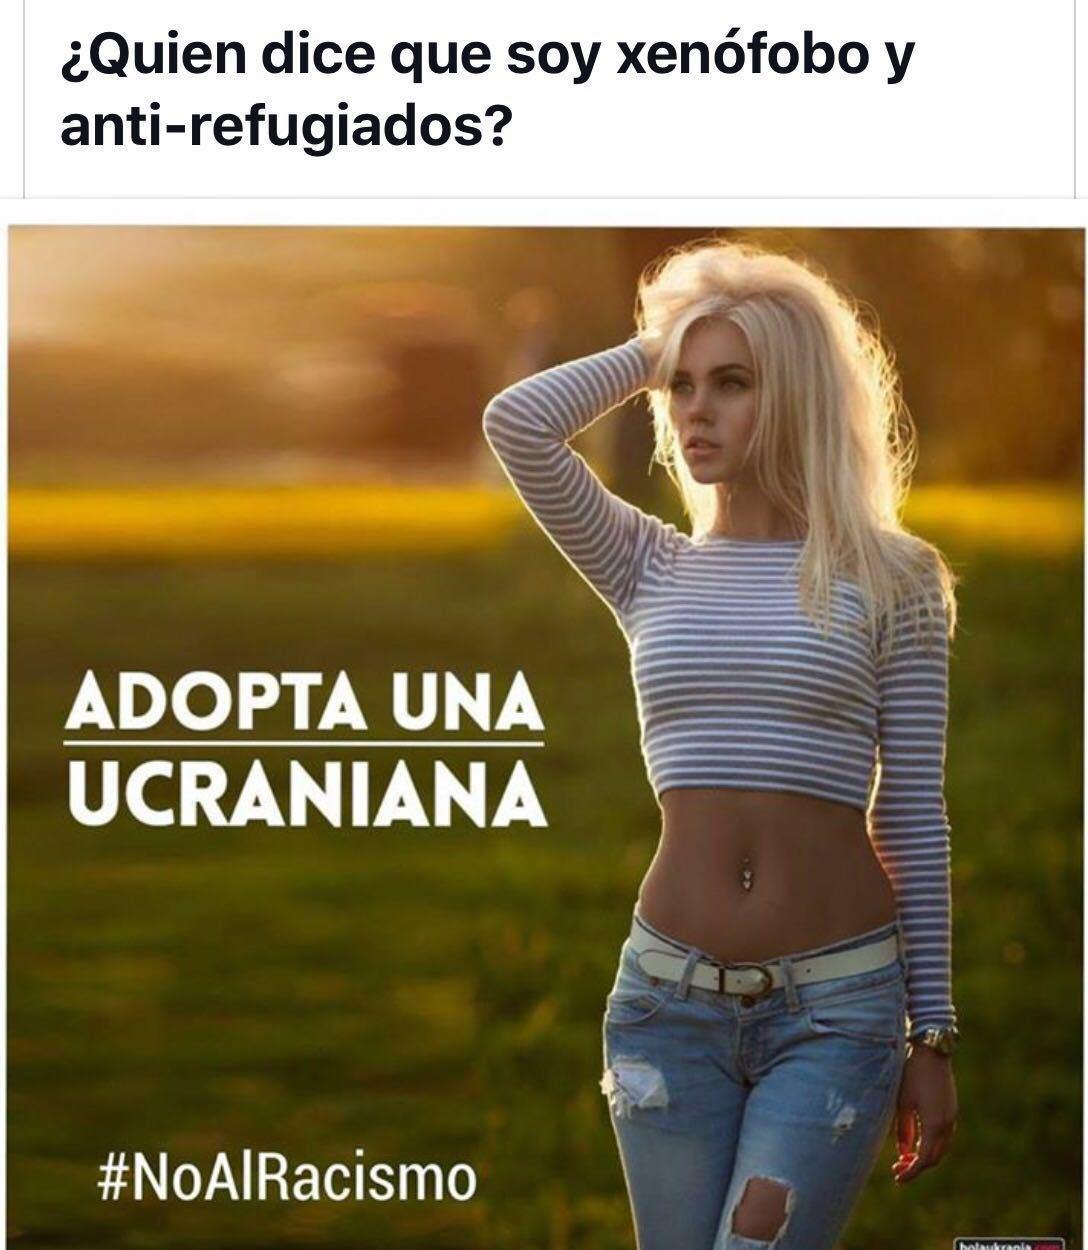 El titulo se fue a ucrania - meme